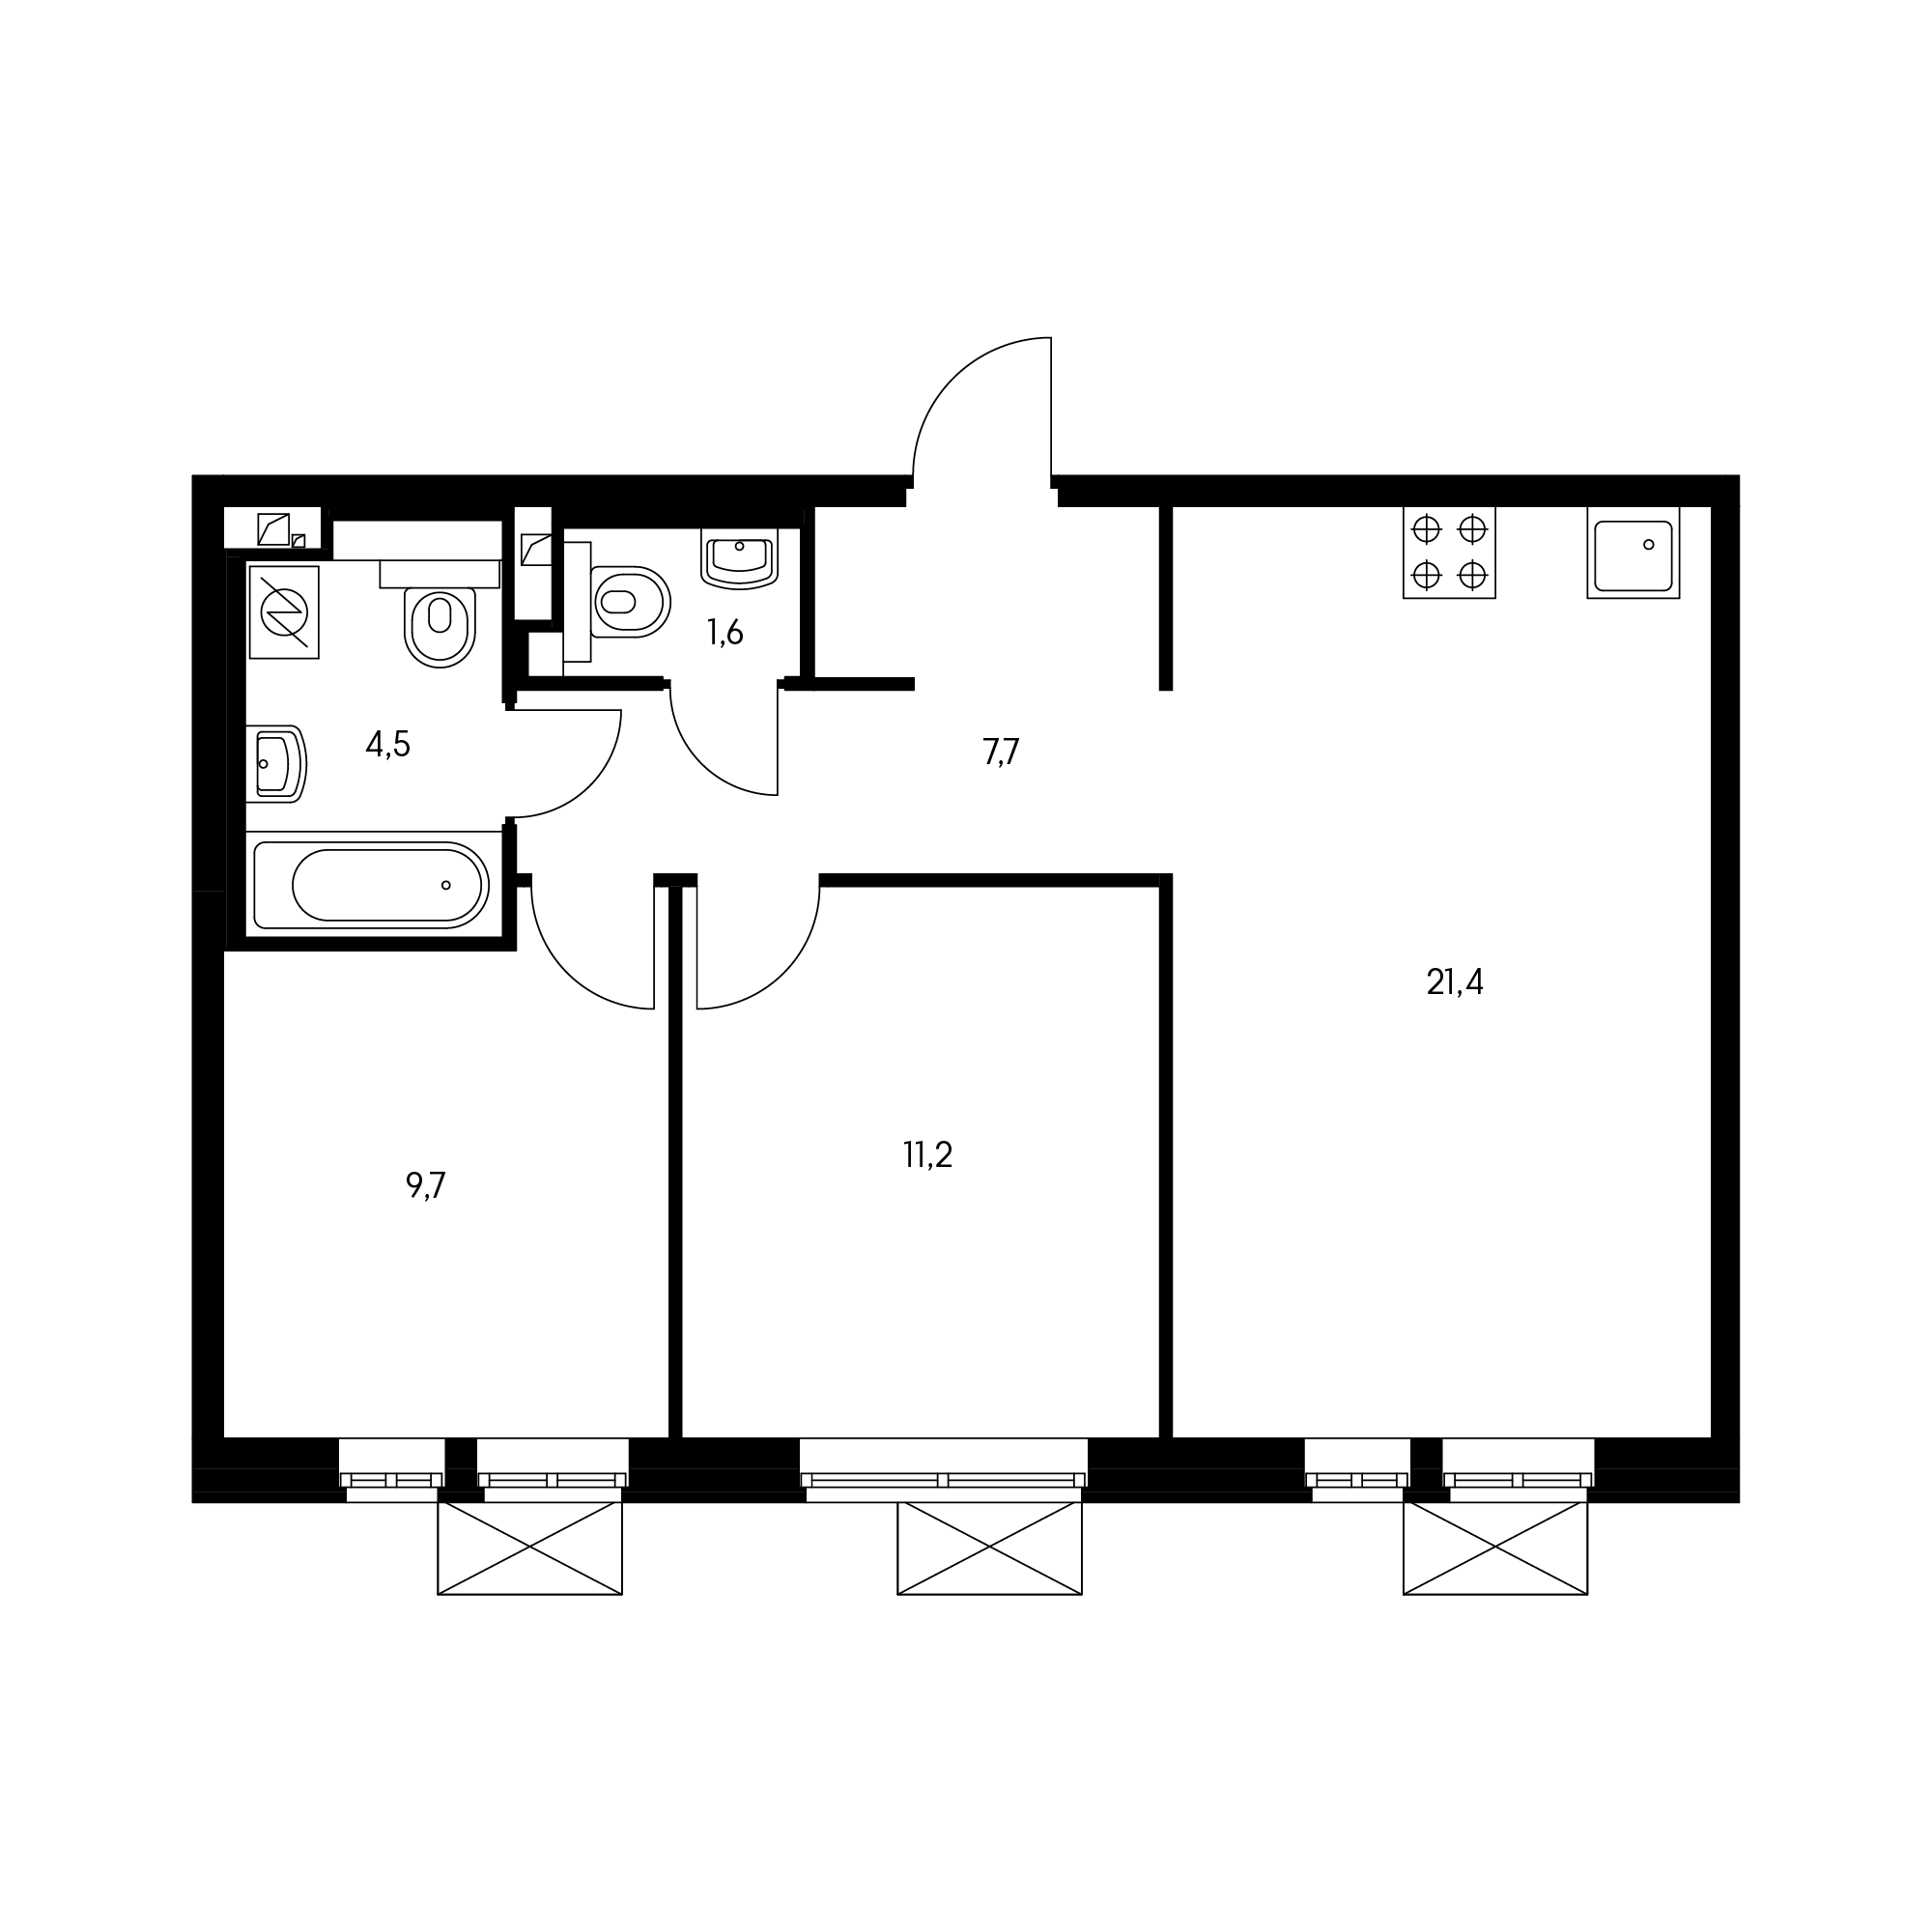 2EM9*_9.9-1